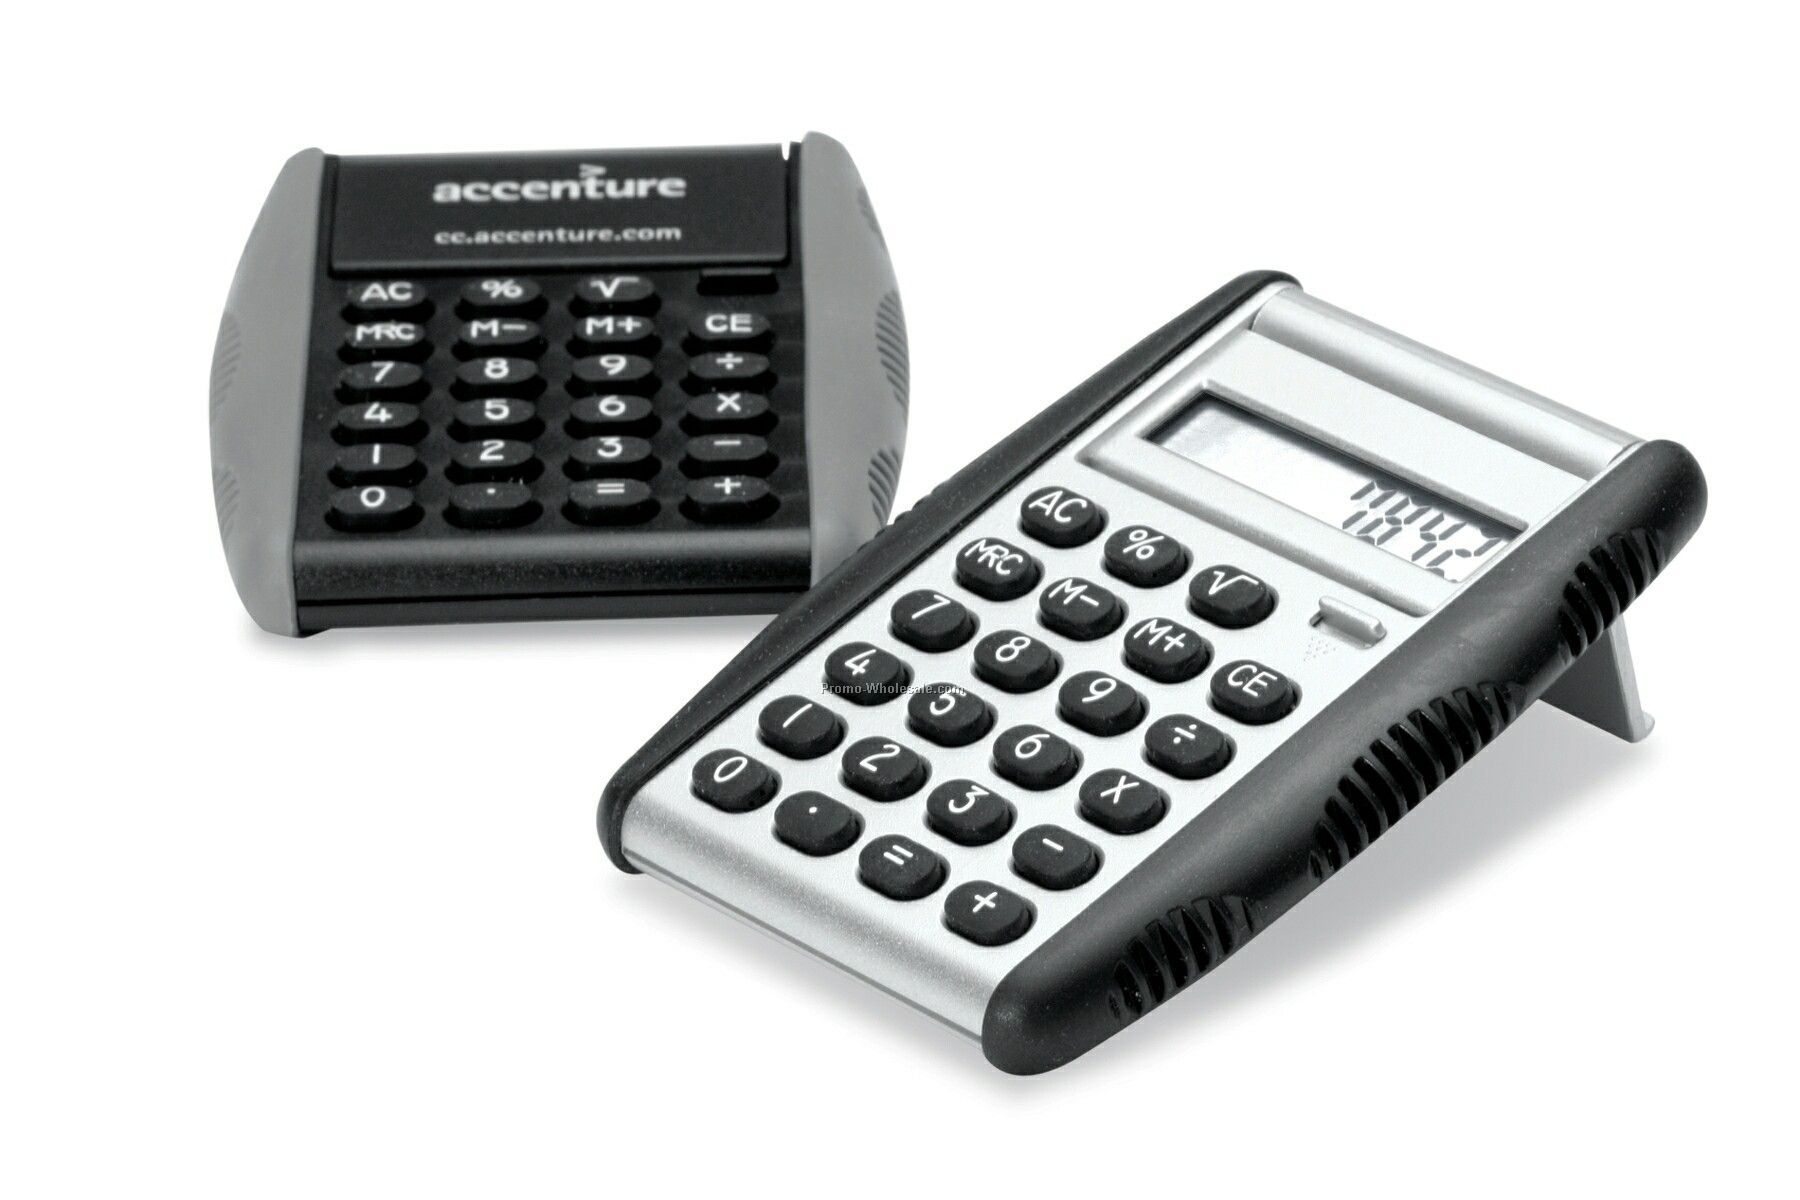 yahoo mortgage calculators: